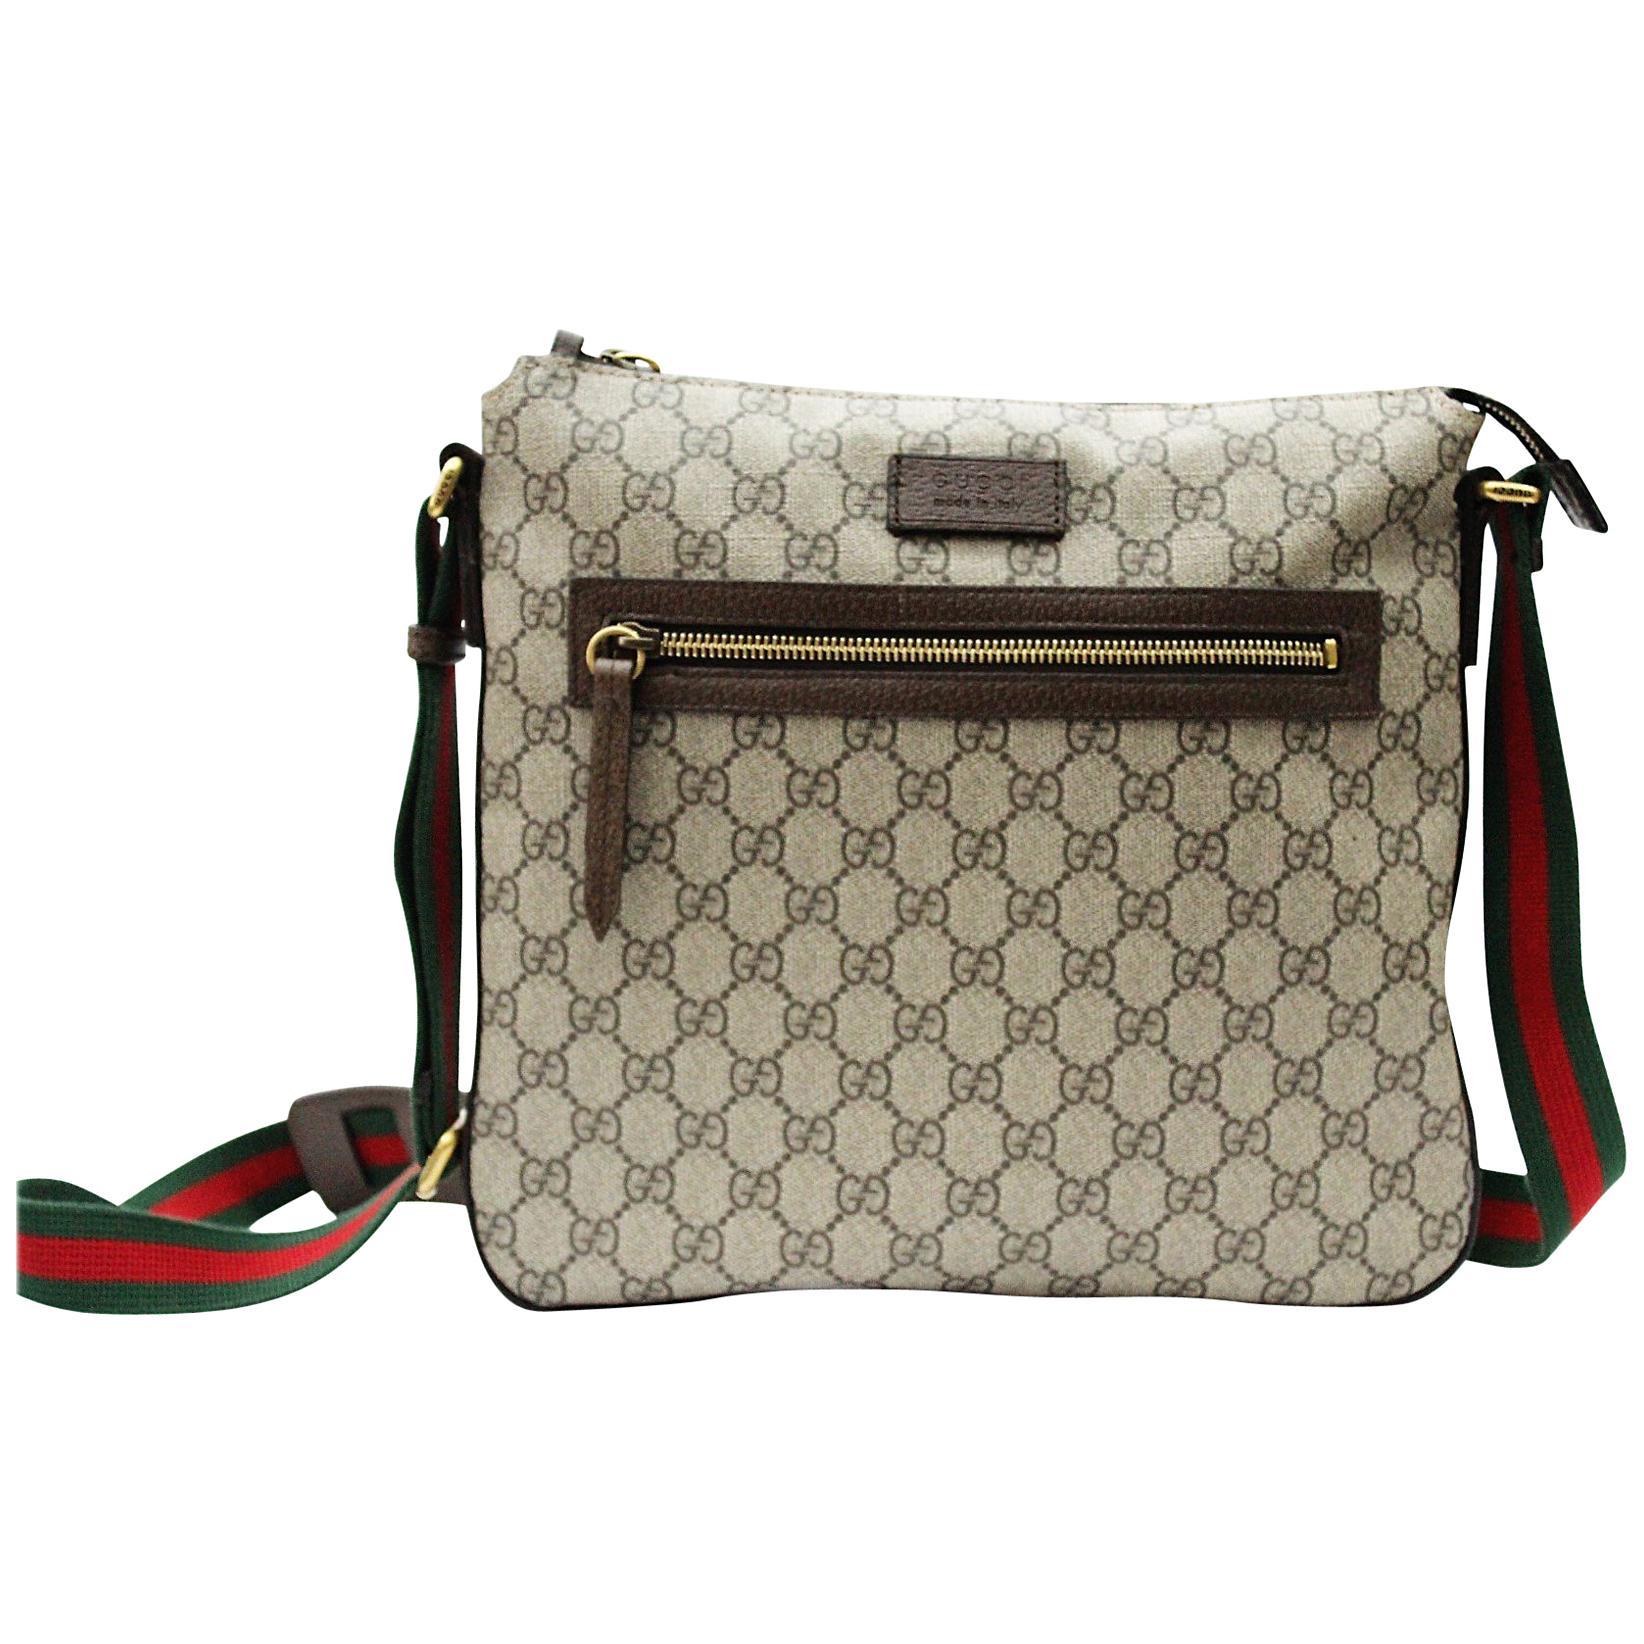 3108b2e8287f 2018 Gucci Man Shoulder Bag at 1stdibs